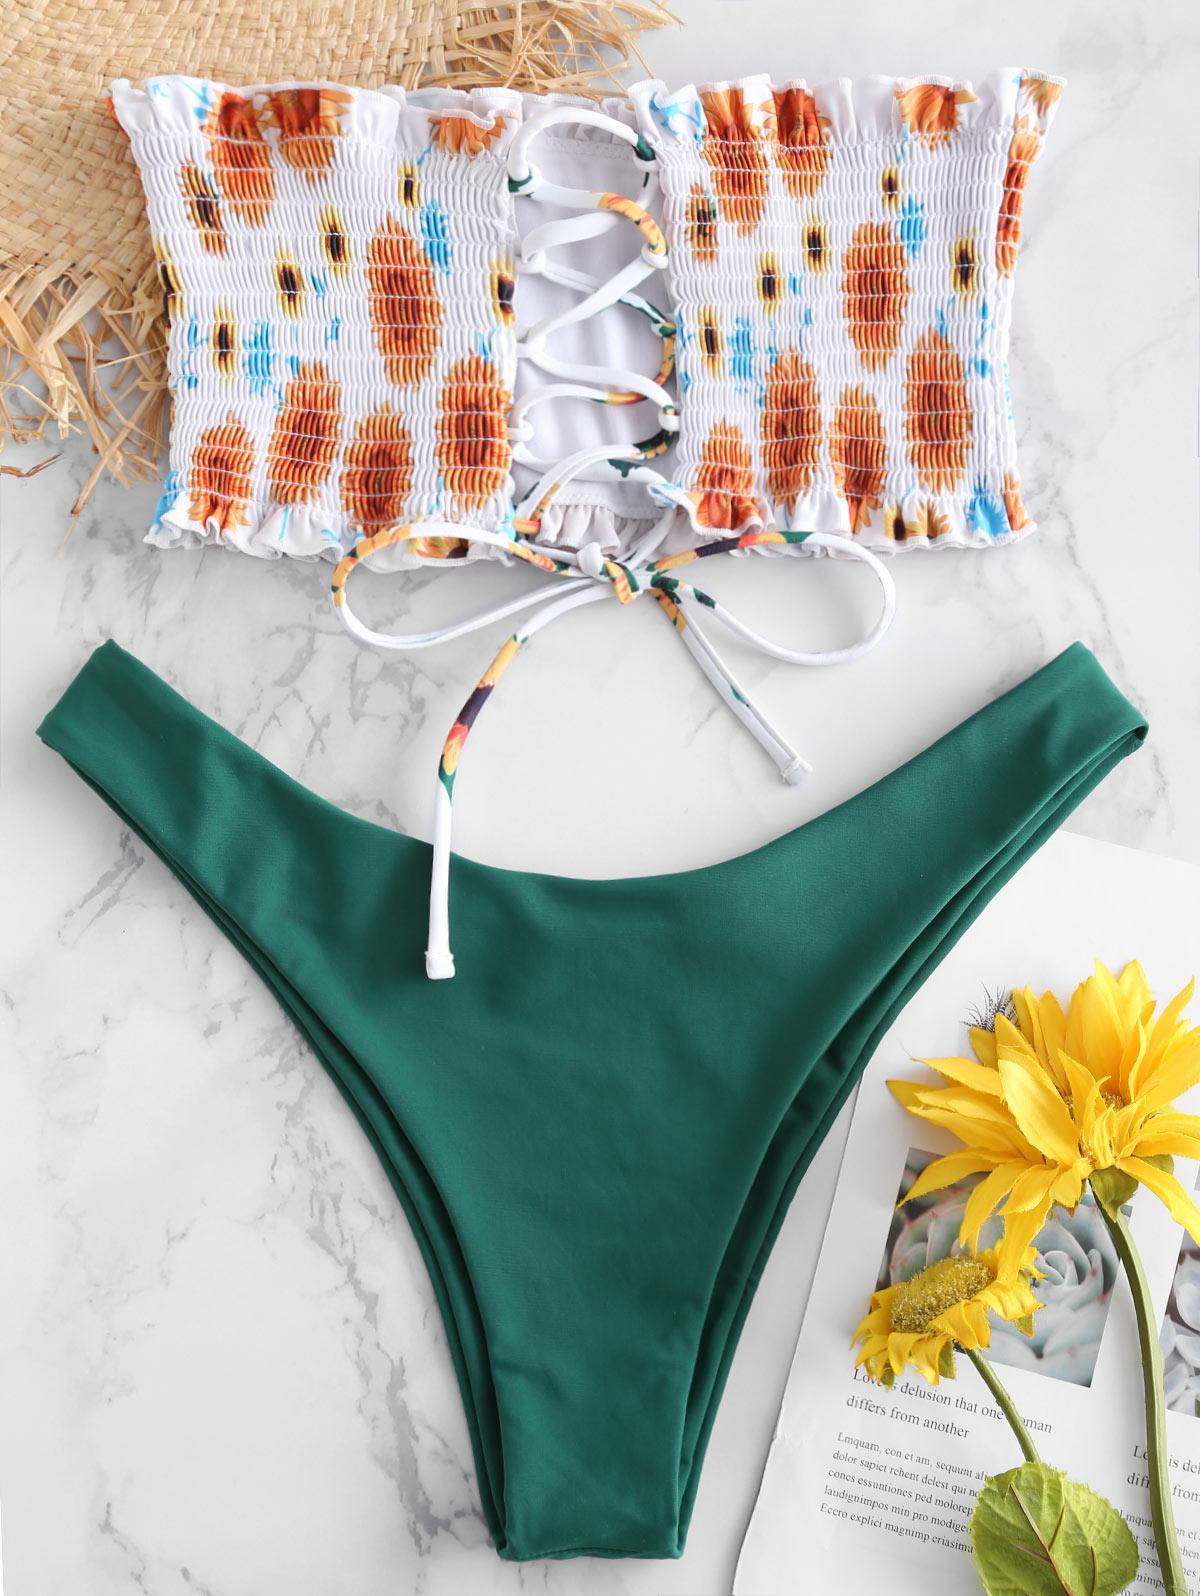 ZAFUL Sunflower Lace-up Smocked Bandeau Bikini